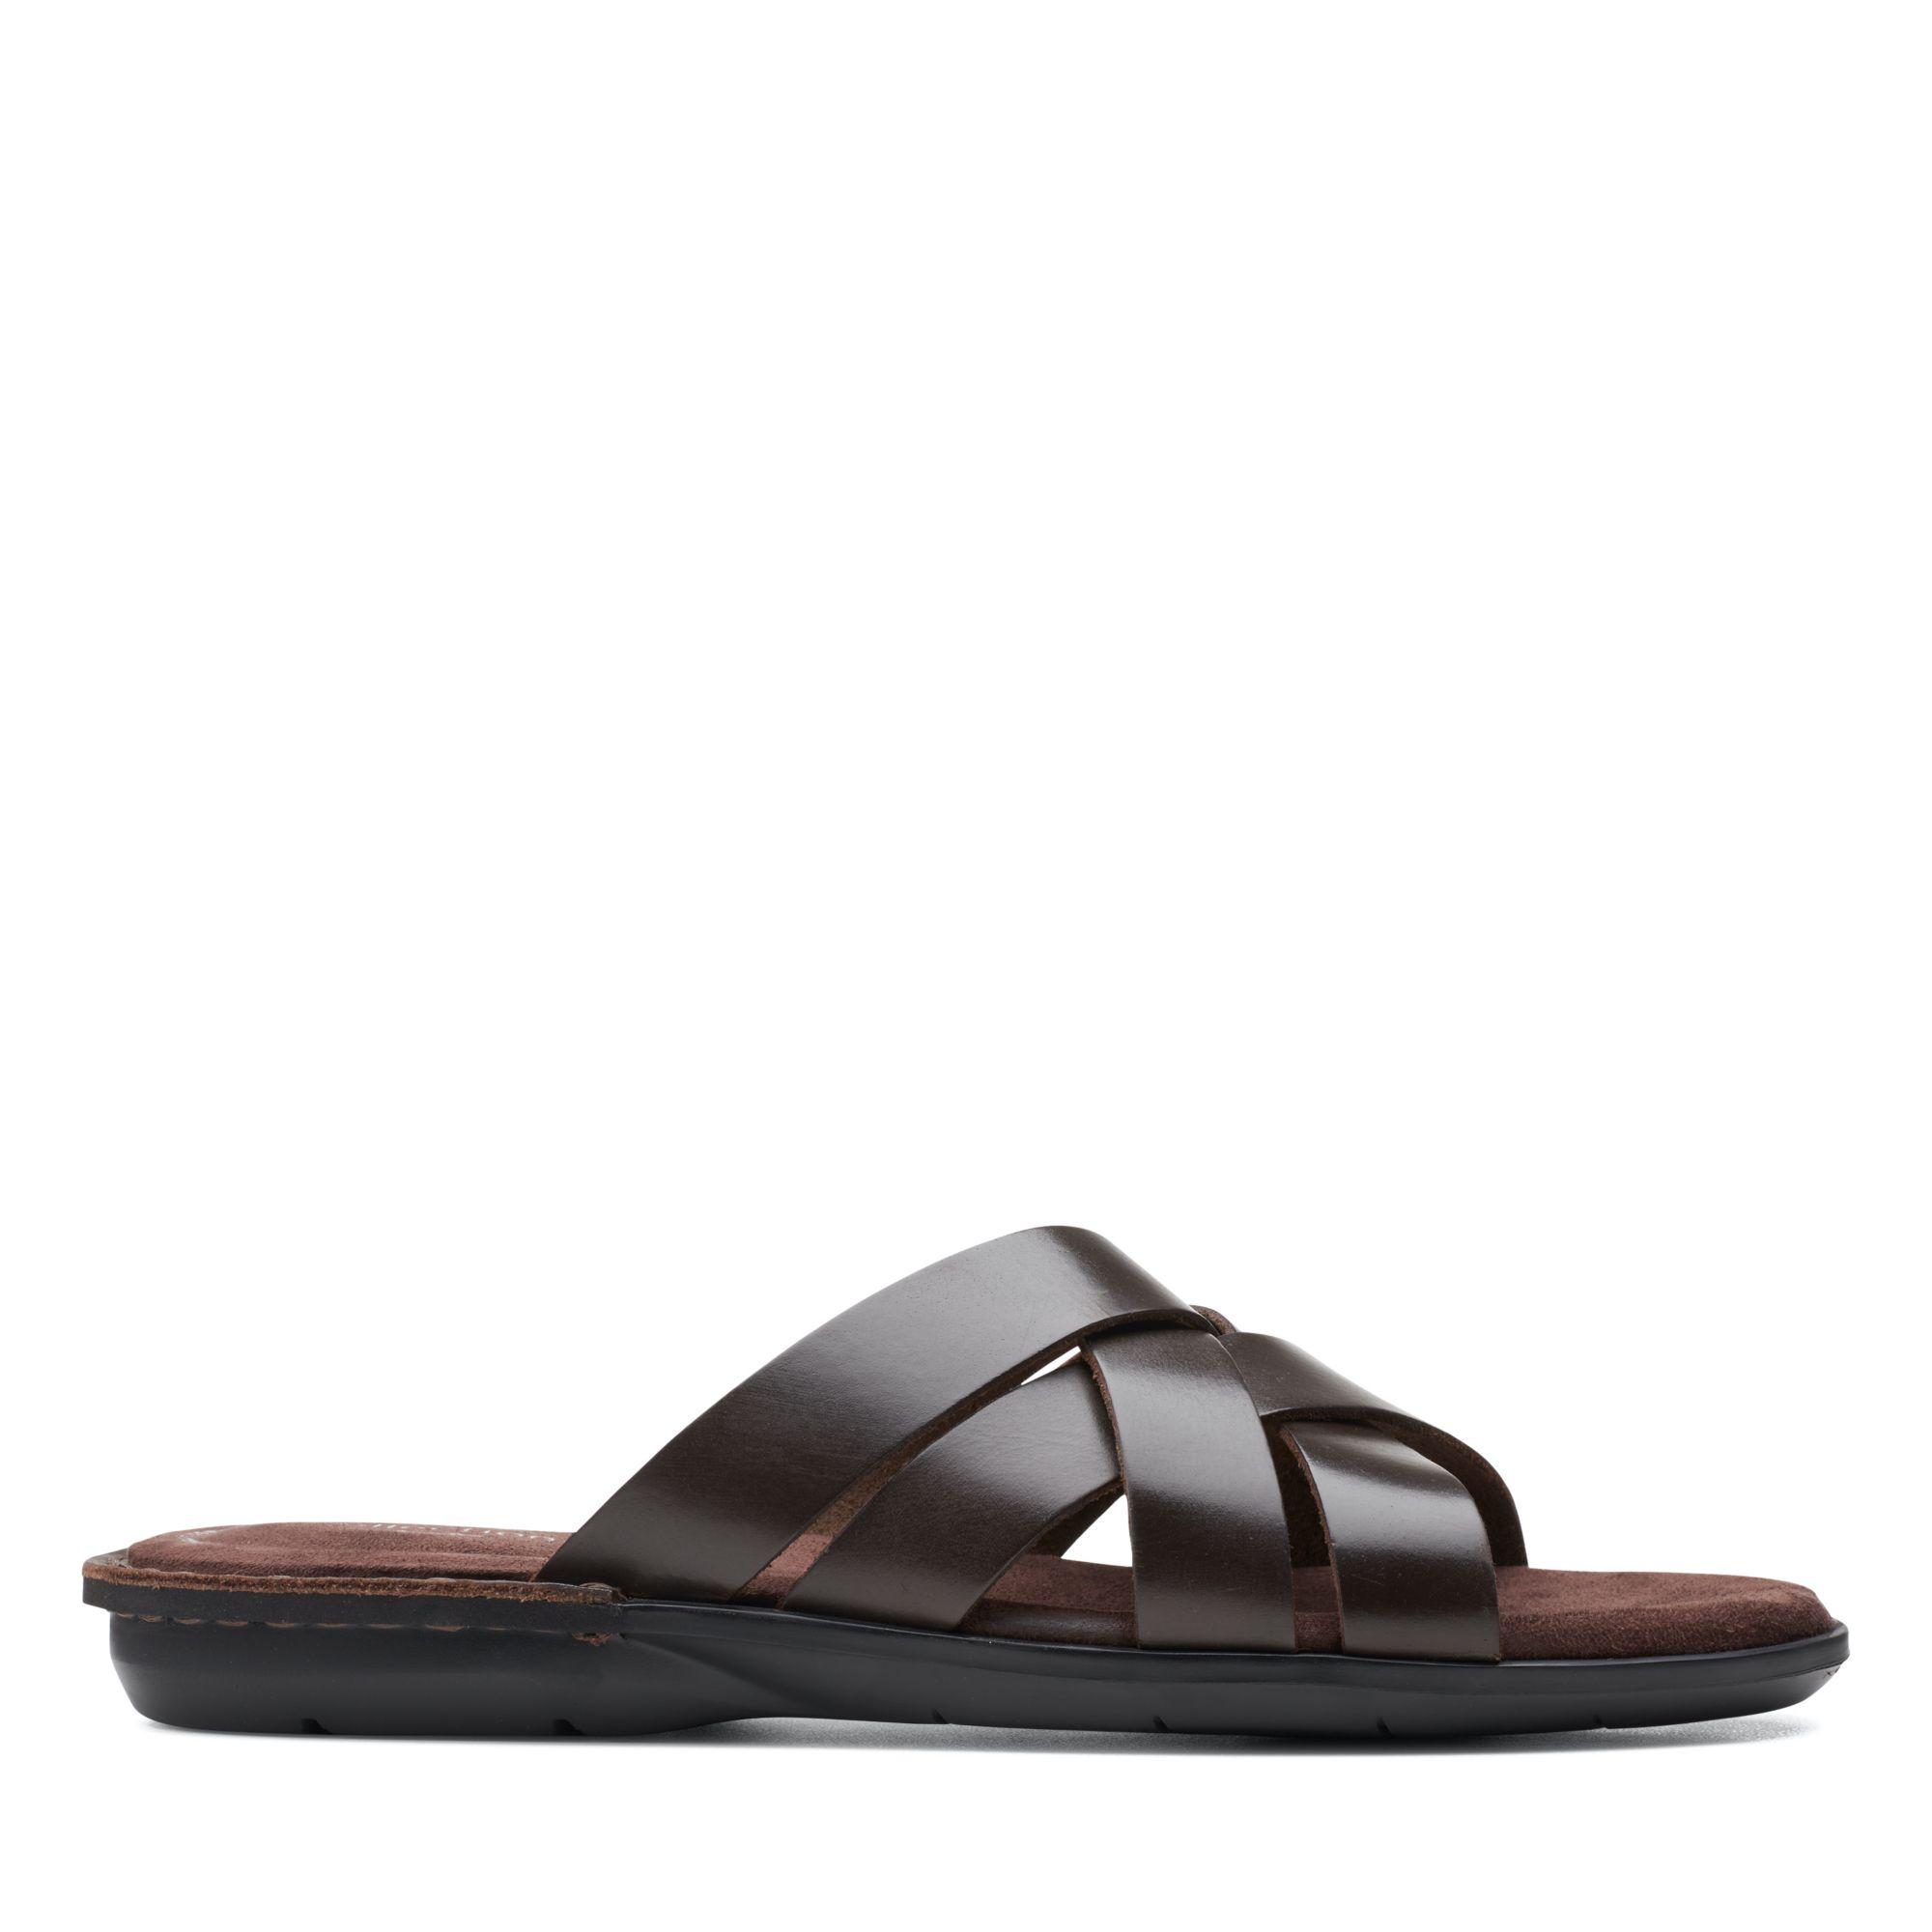 Clarks 夏日街頭-Ellison Weave編織風皮革拖鞋(深棕色)